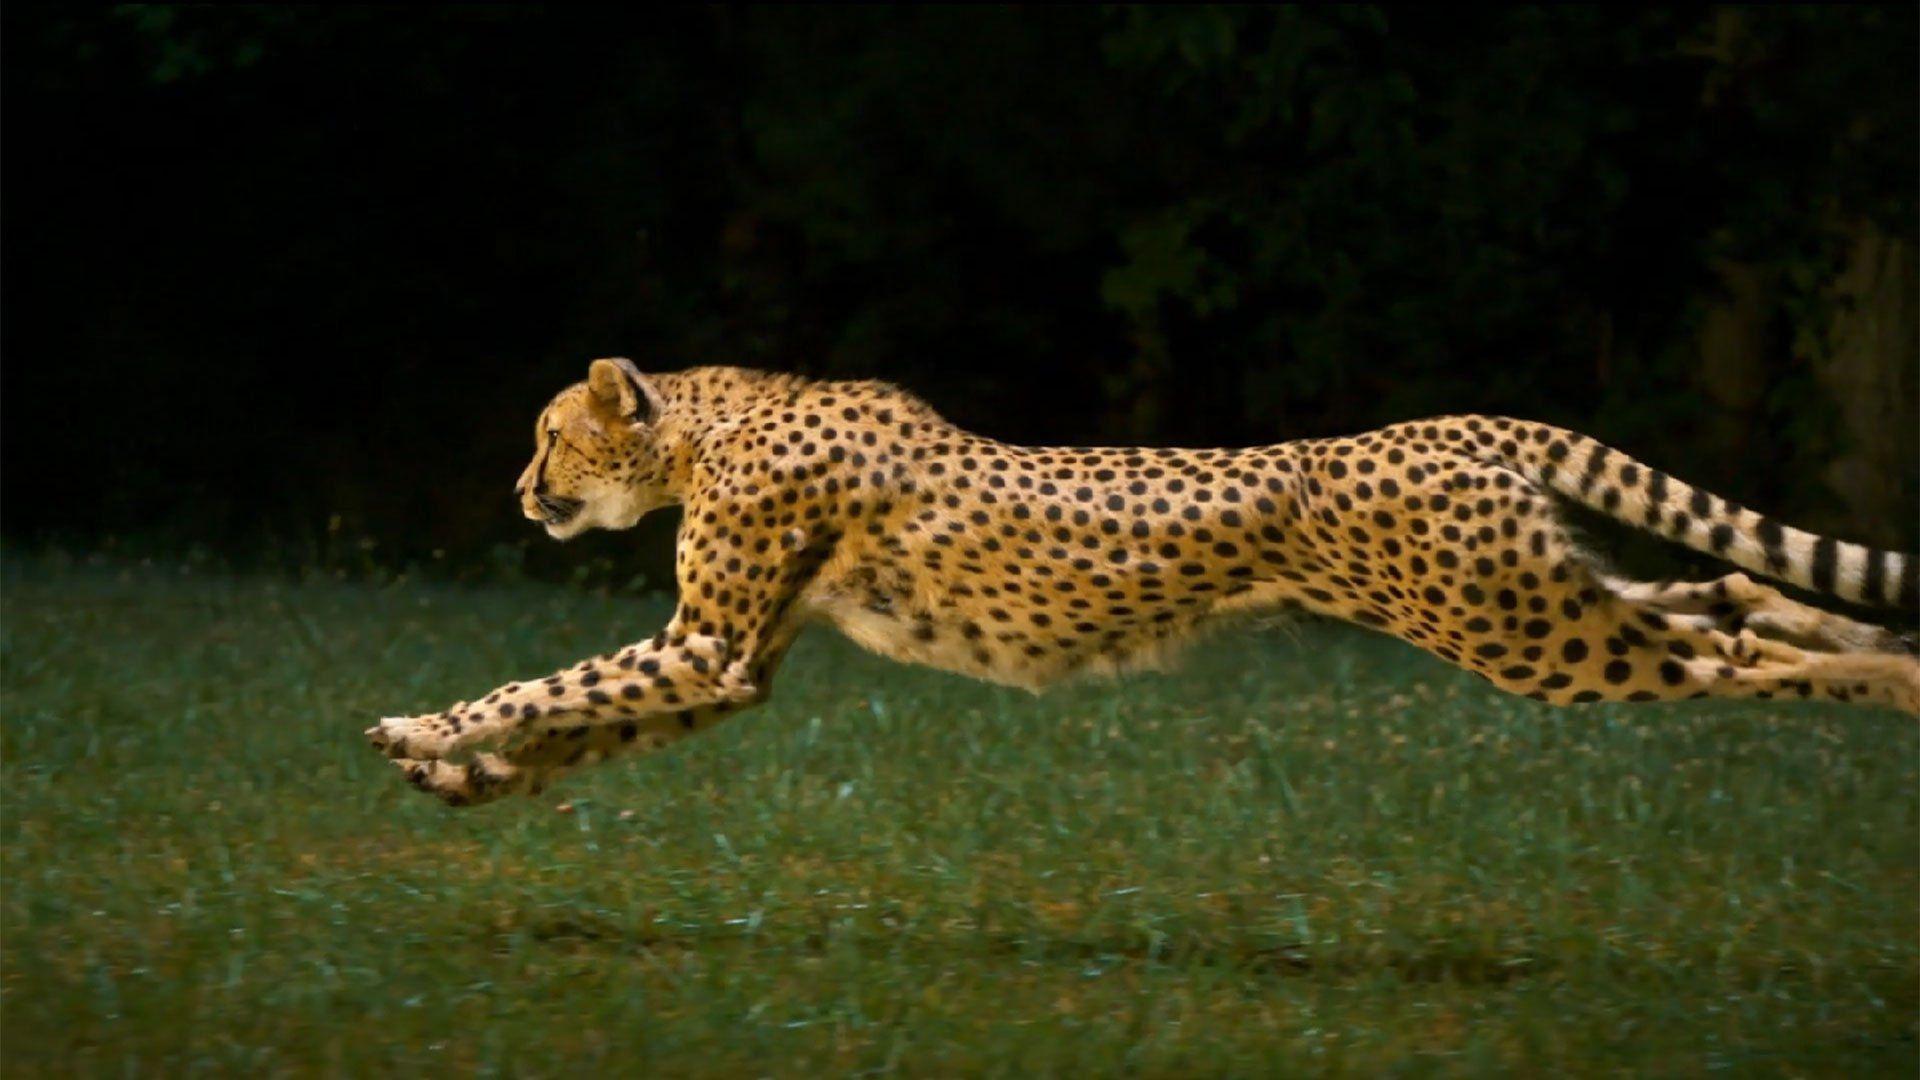 Cheetah Running With Images Cheetah Wallpaper Animals